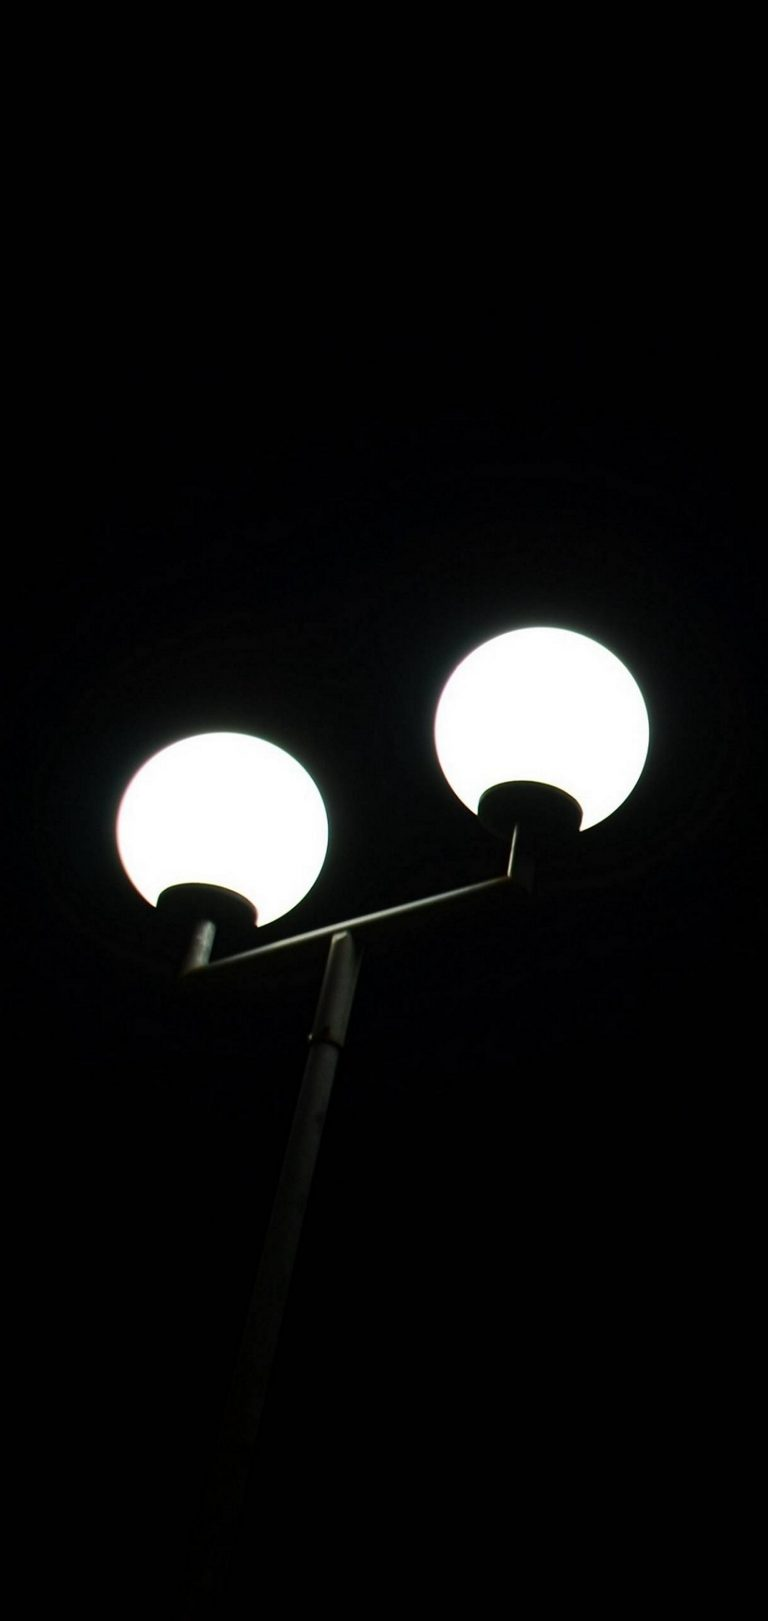 Lantern Light Bulb Minimal Wallpaper 1440x3040 768x1621